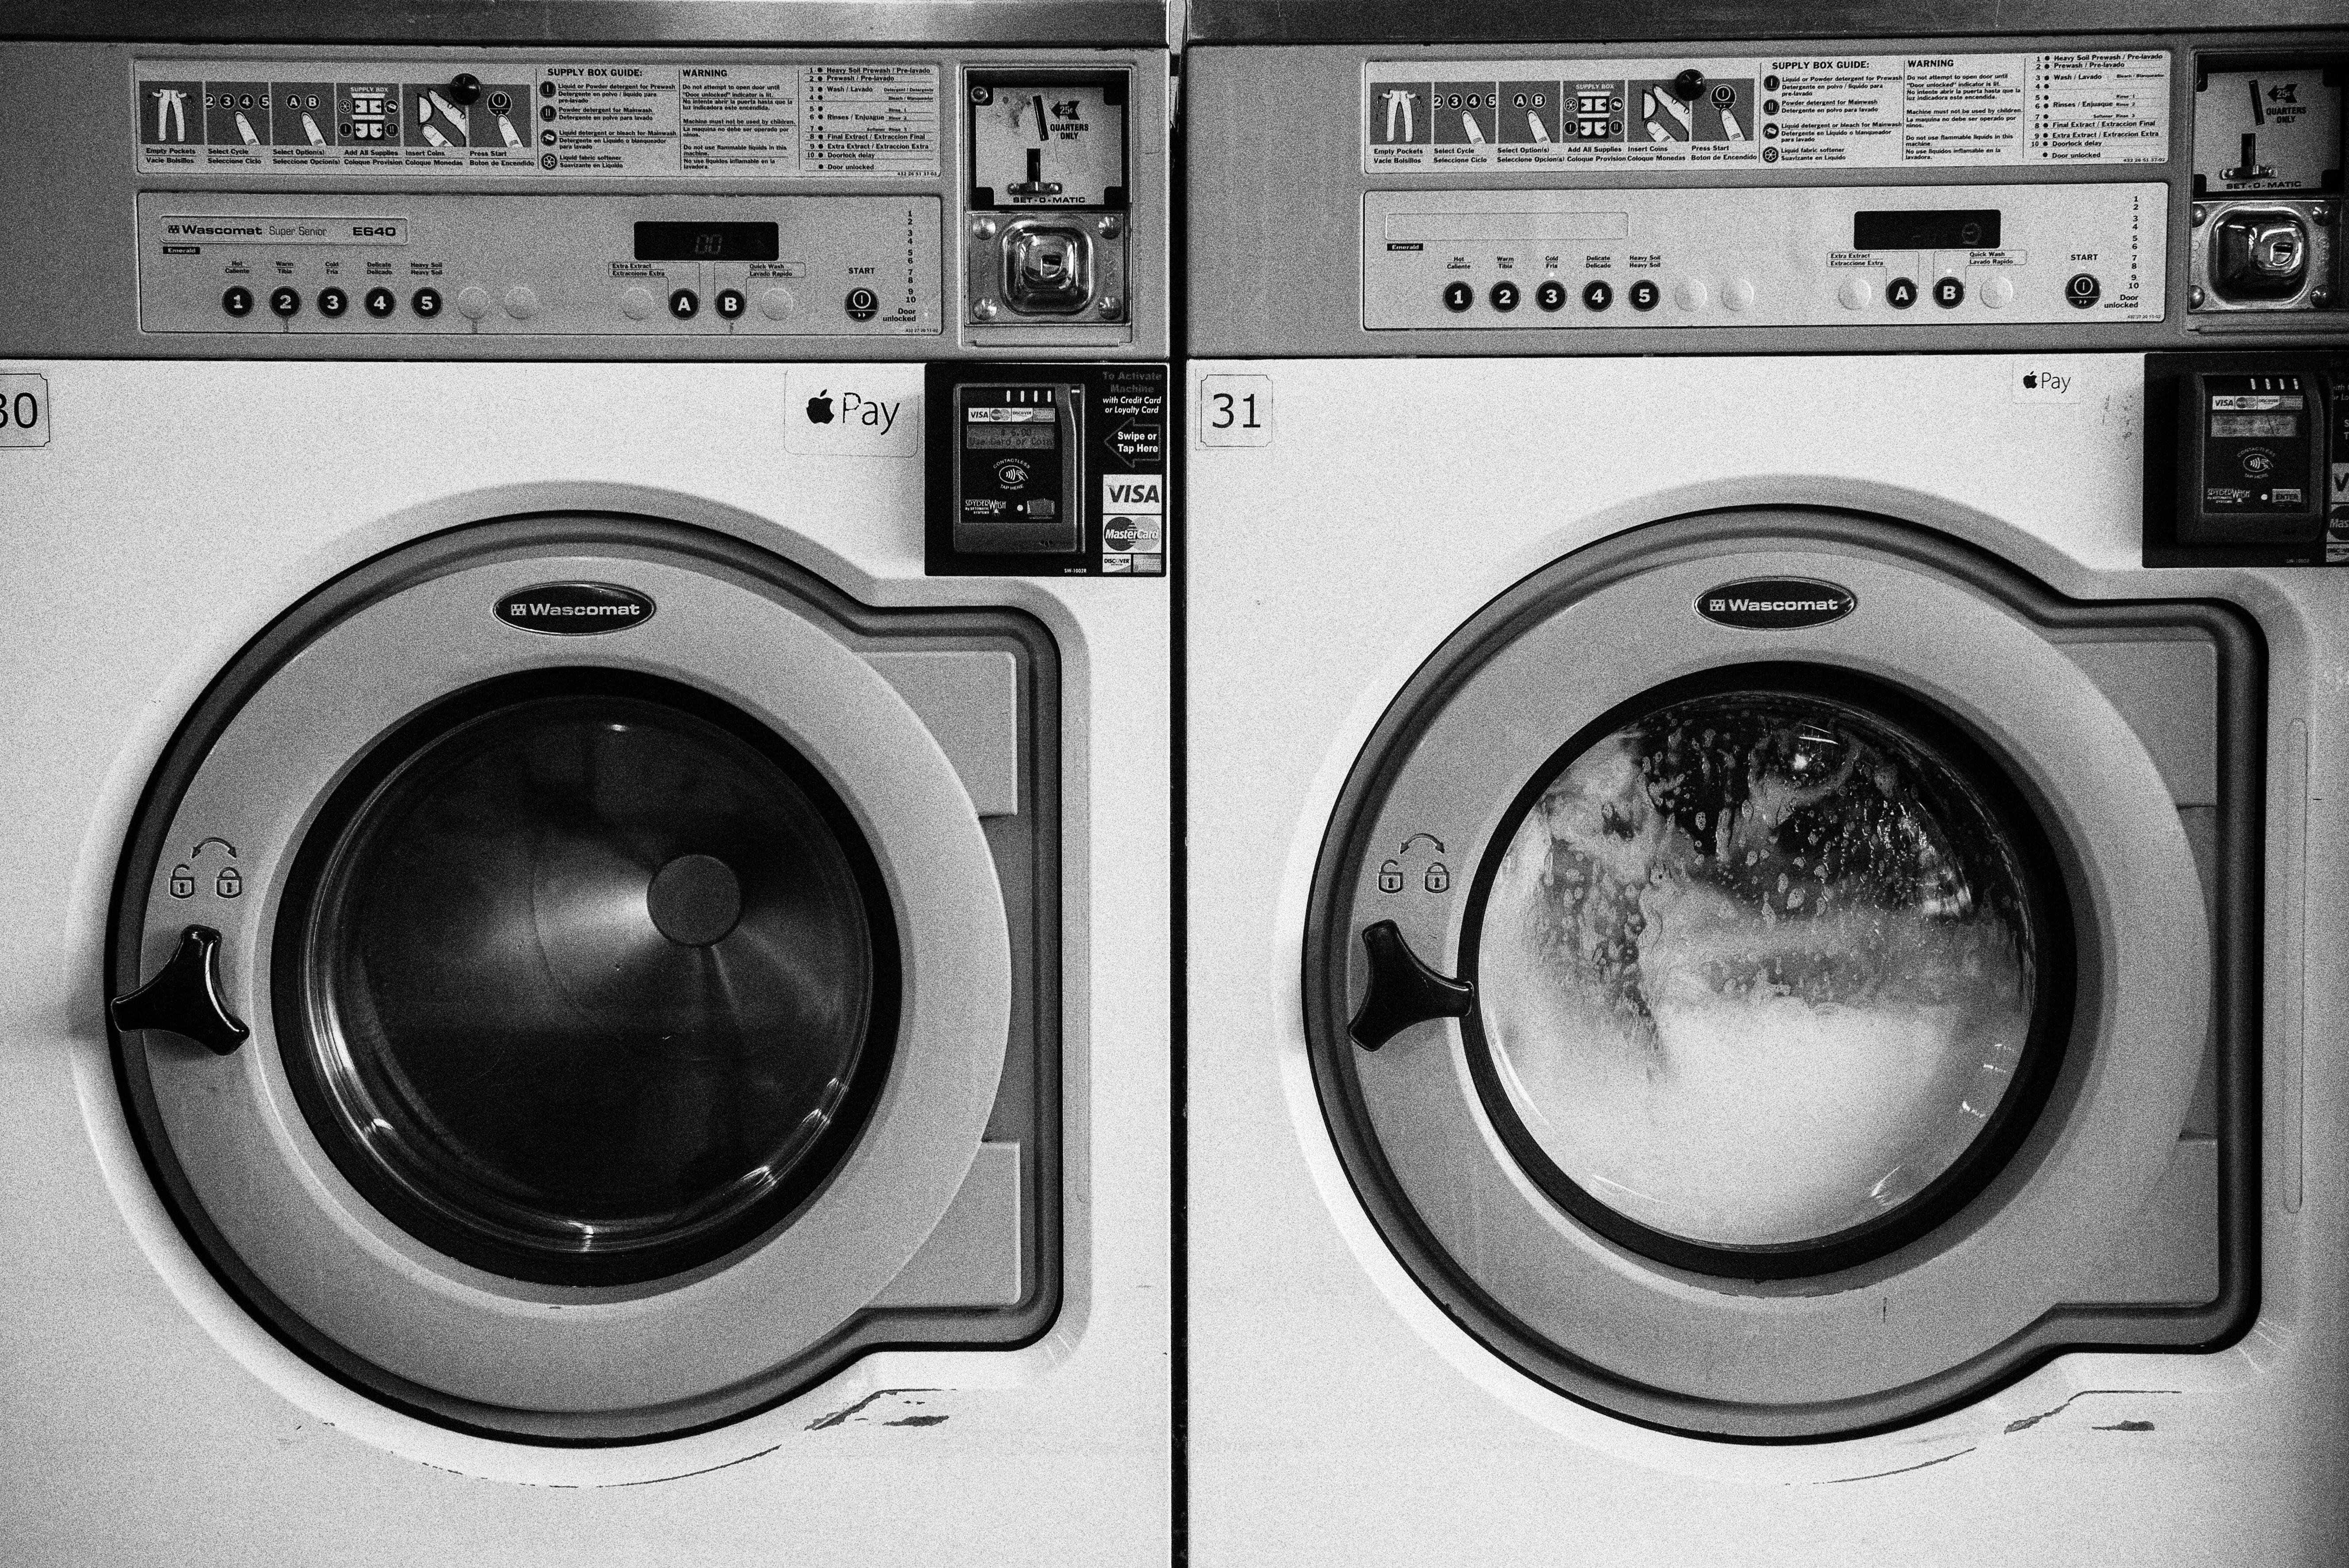 Washing Machines in Black and White